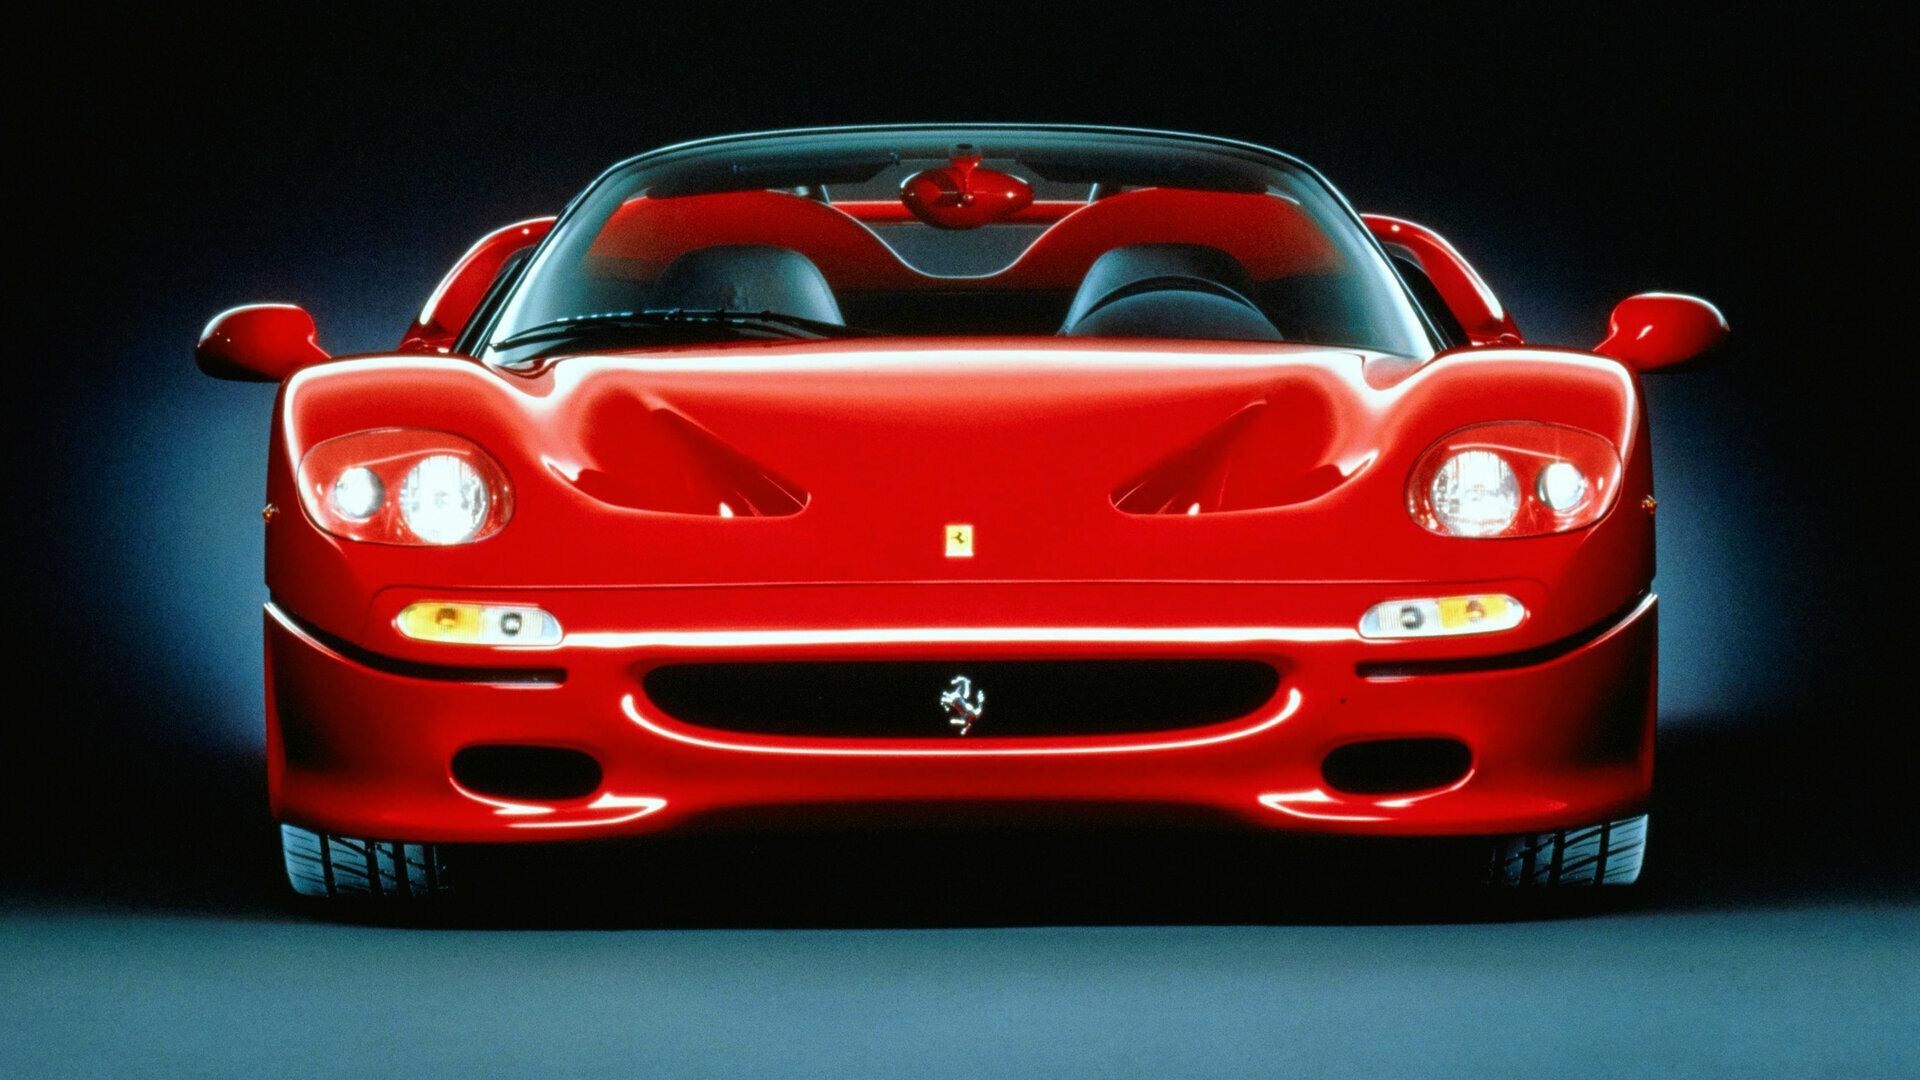 Coche del día: Ferrari F50